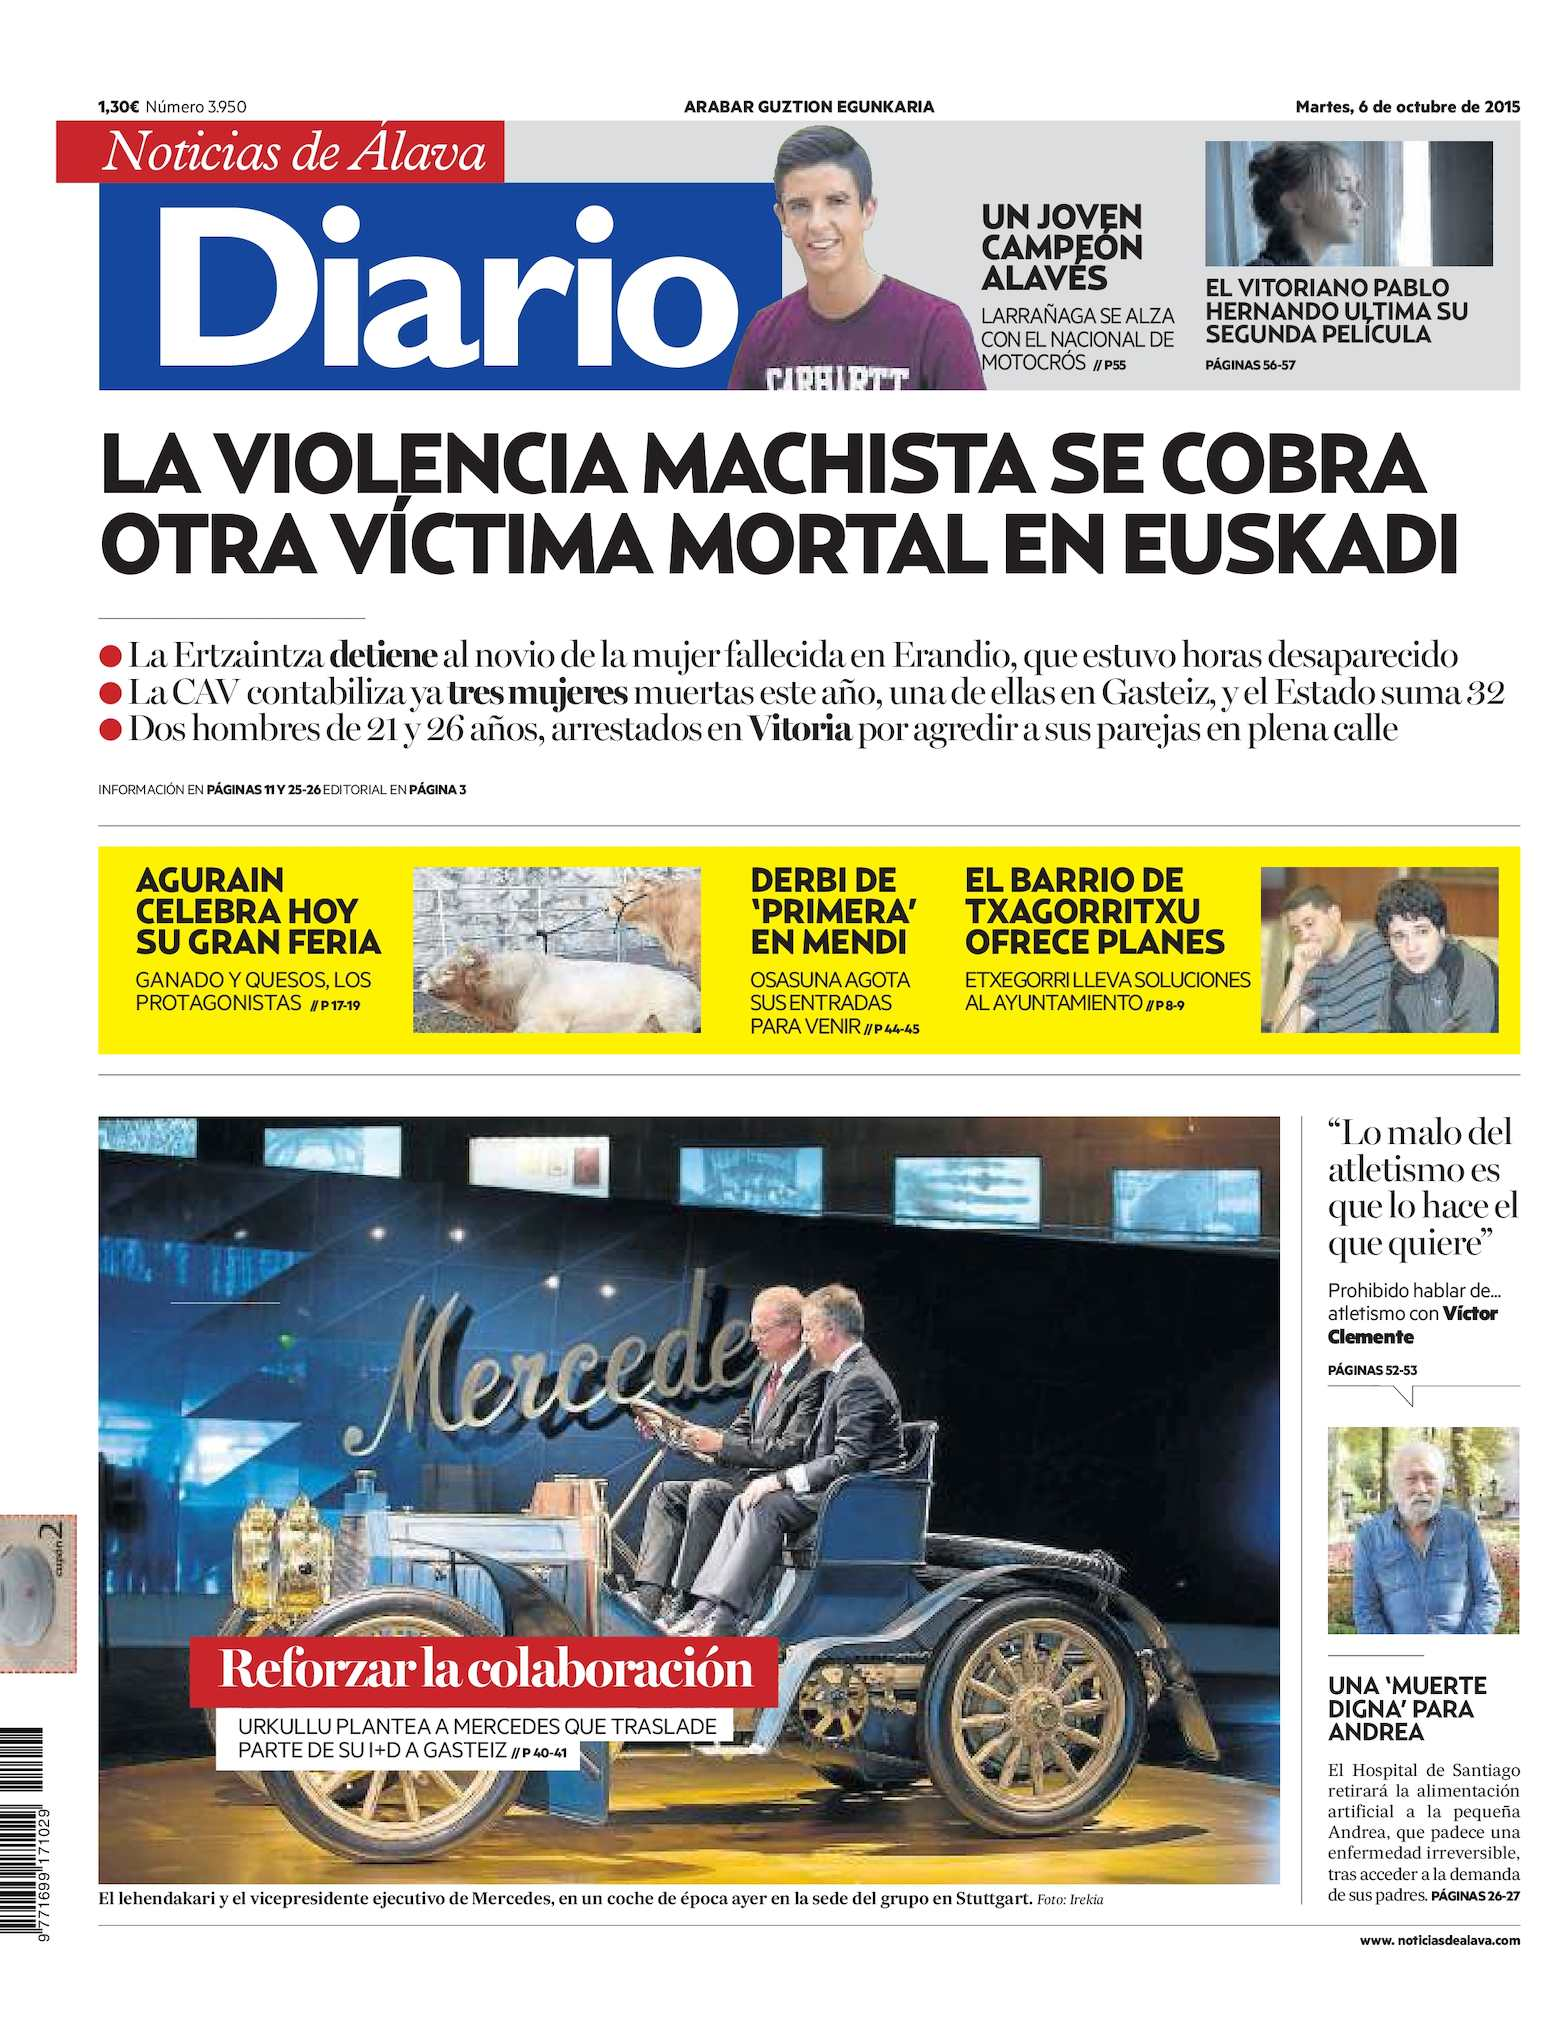 8af8830c7537 Calaméo - Diario de Noticias de Álava 20151006